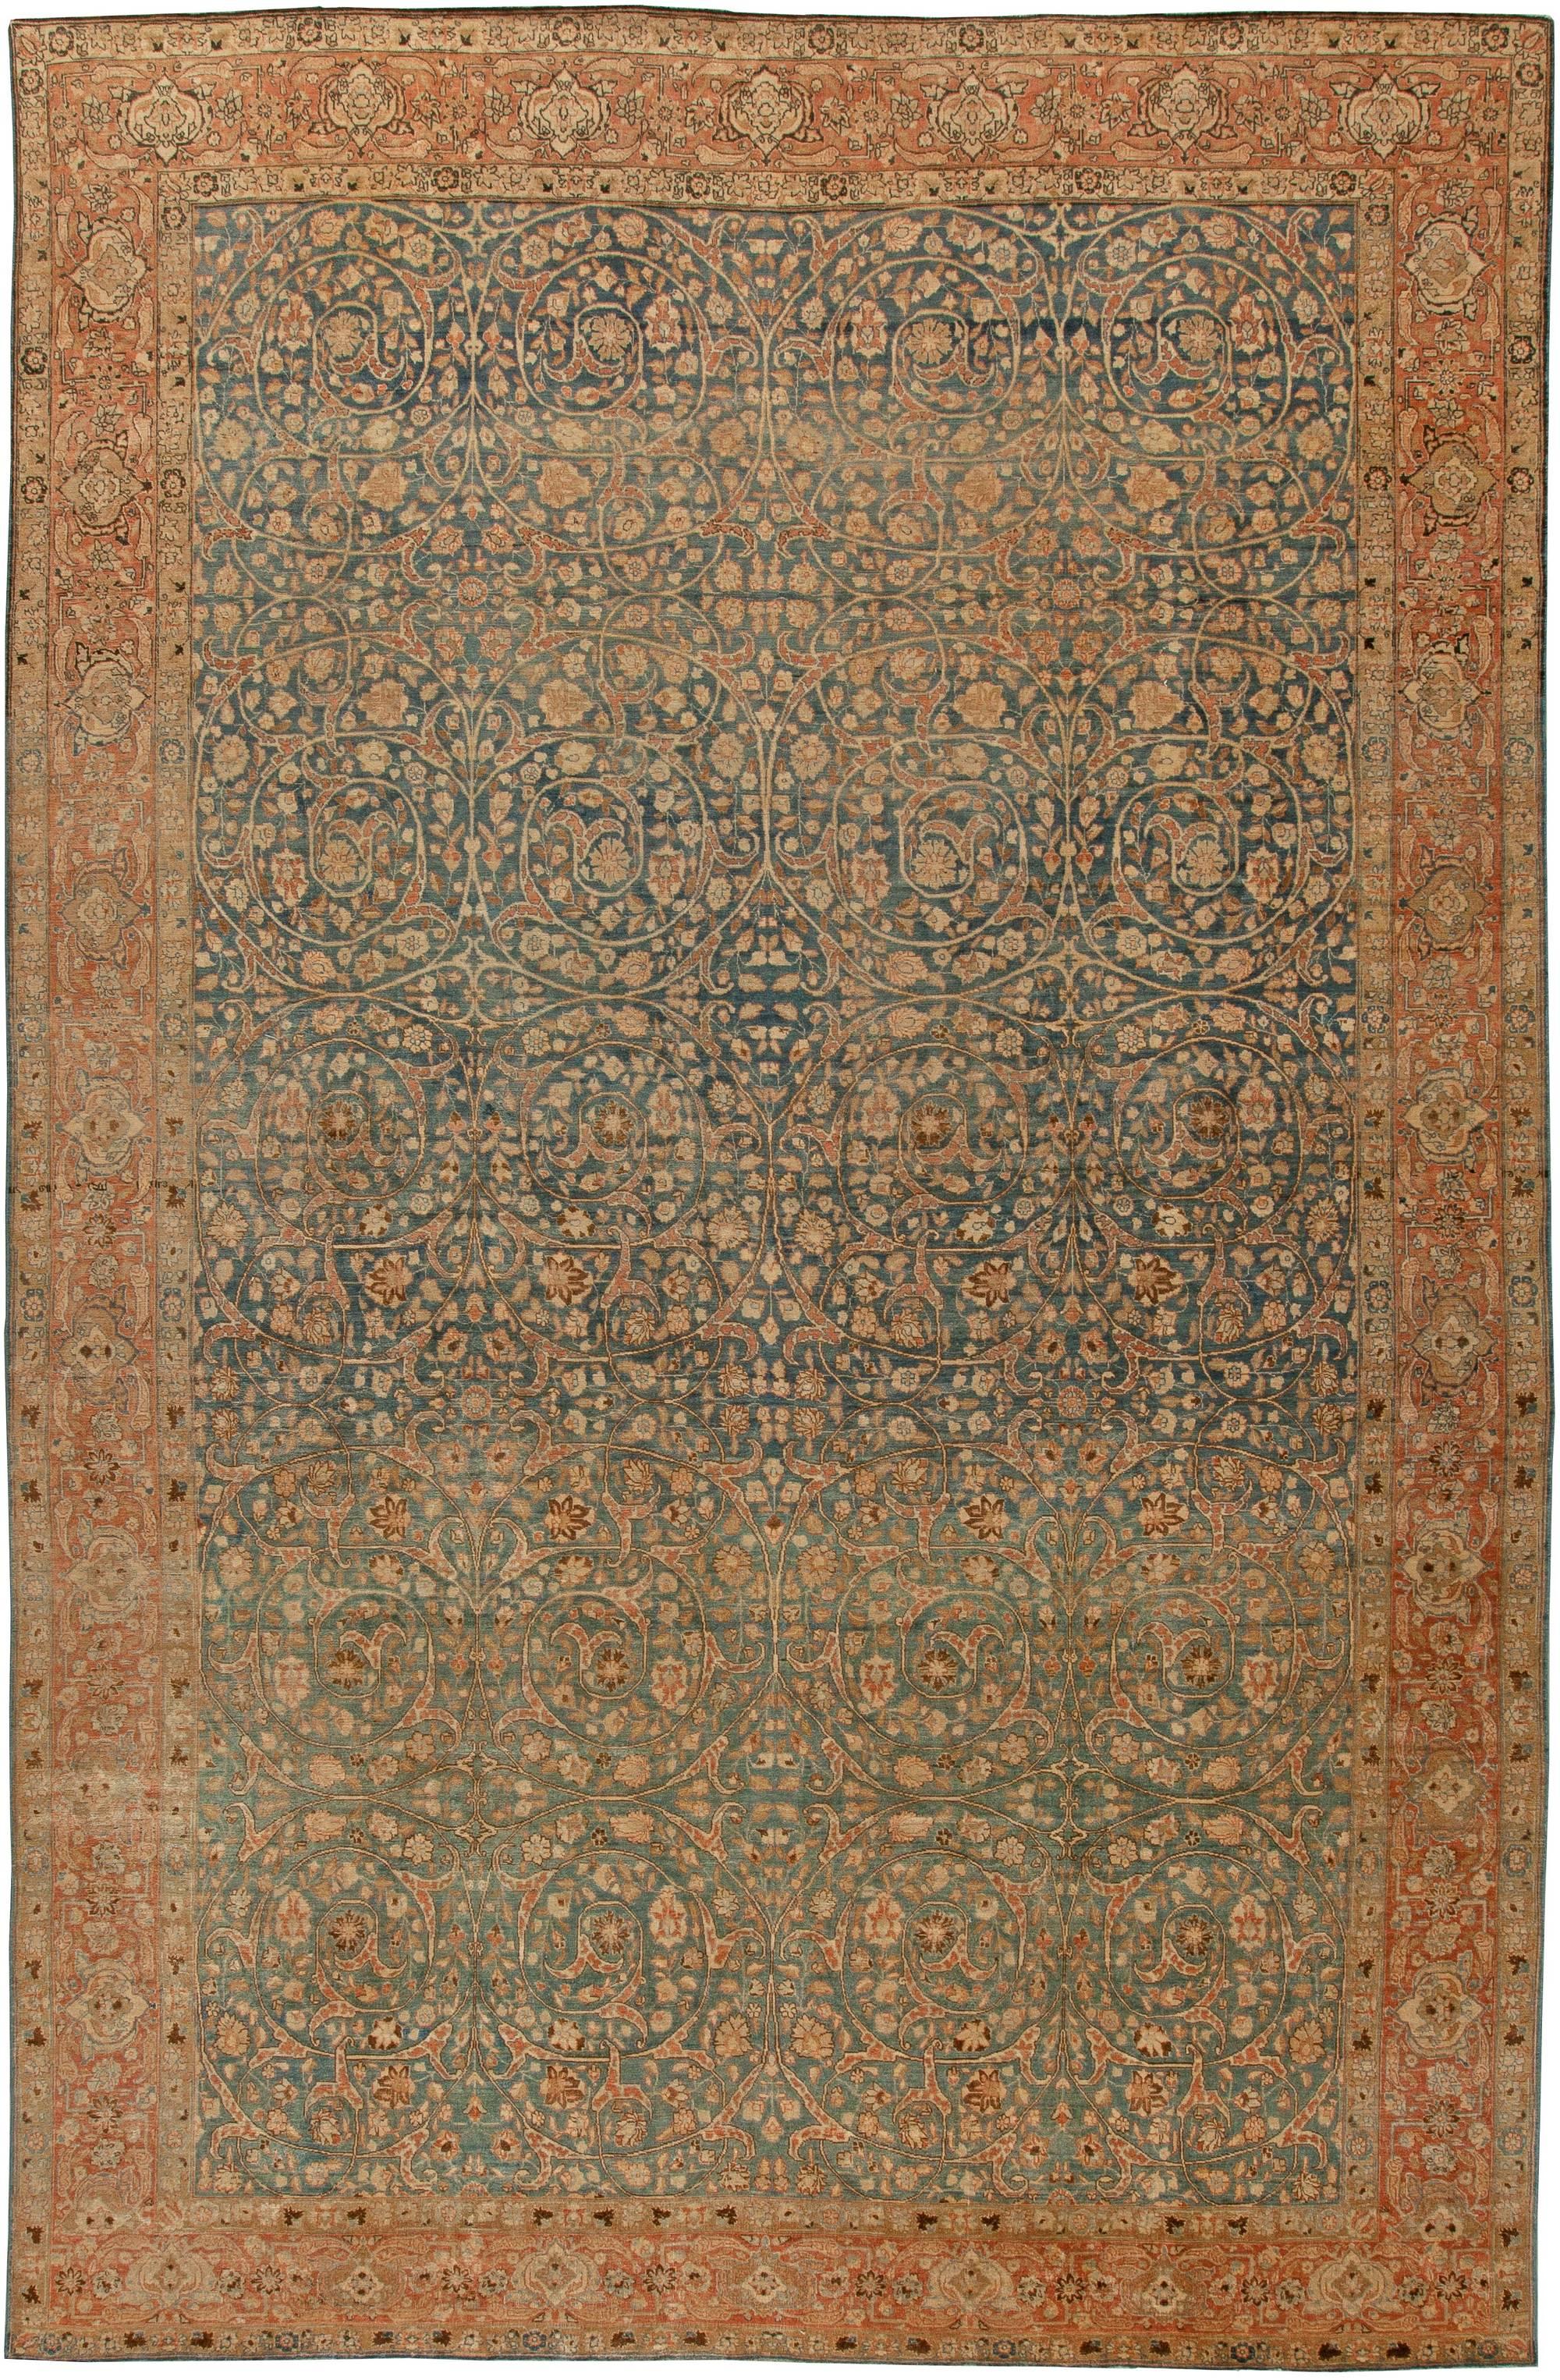 Antique Persian Tabriz Carpet BB5737